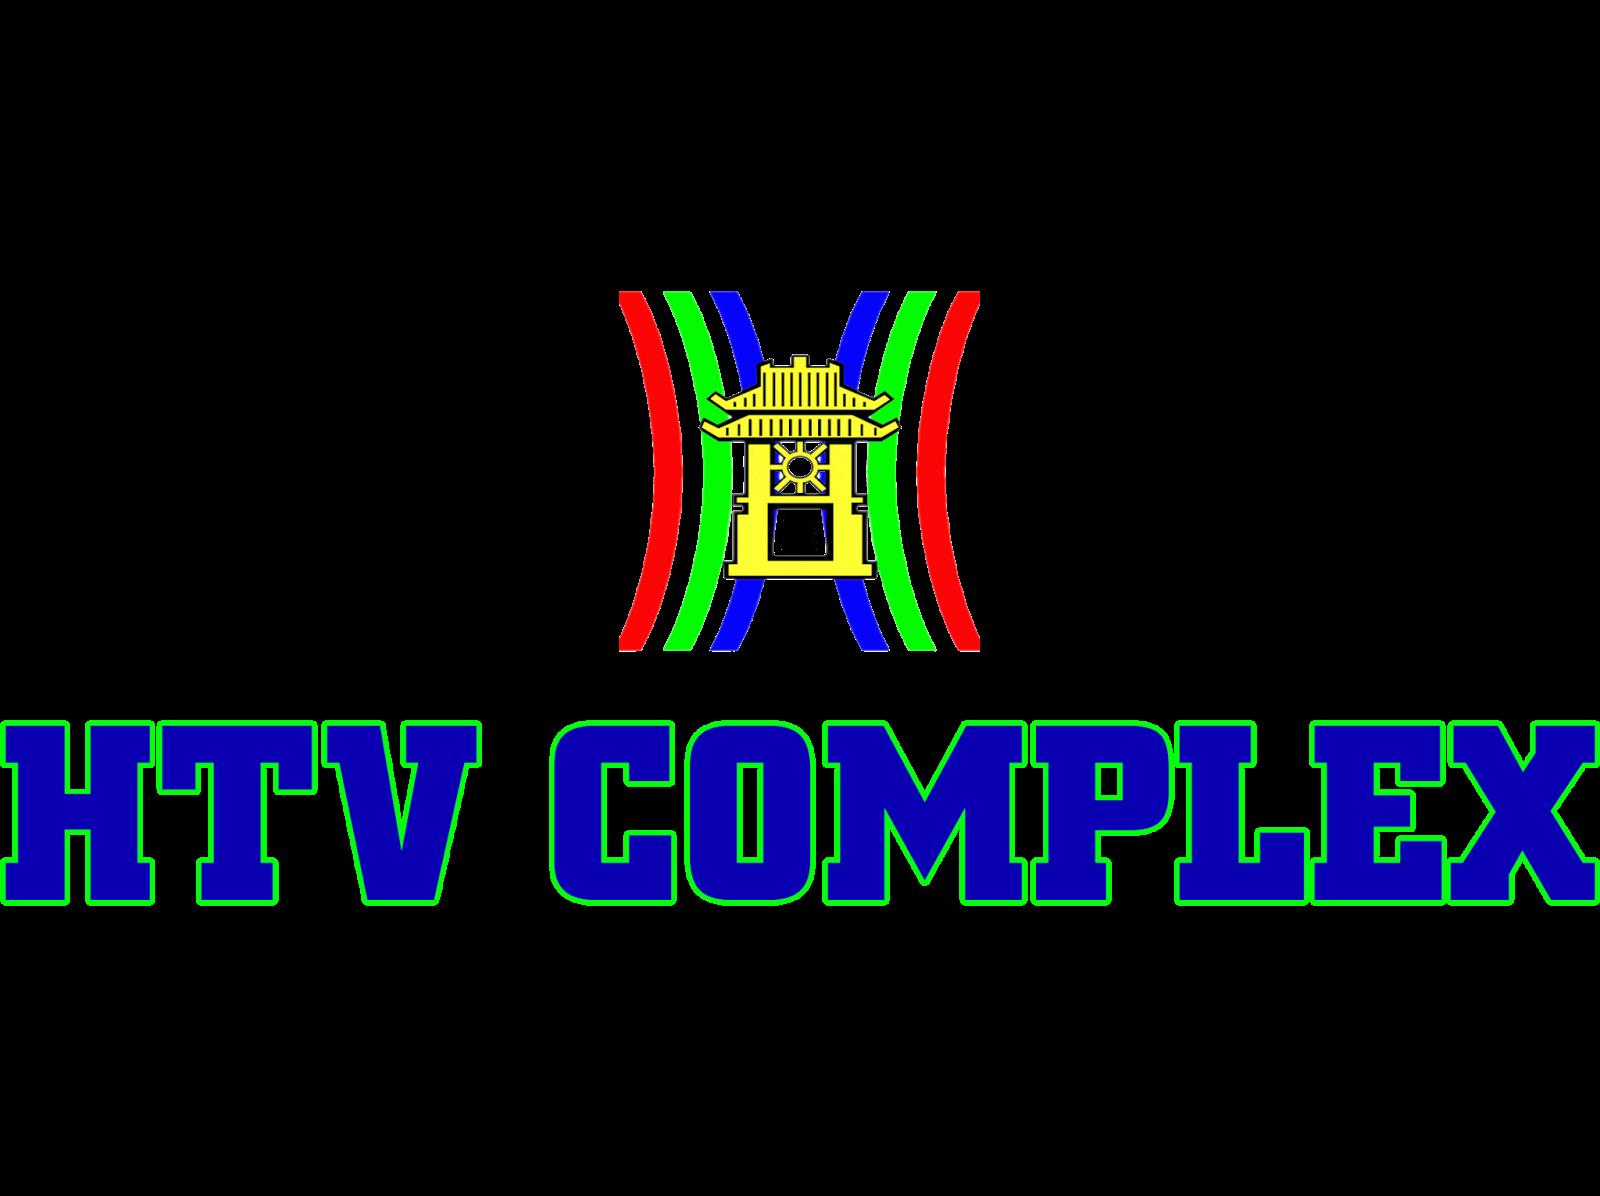 Chung cư HTV Complex | Chung cư HTV Complex Văn Phú | Chung cư HTV Complex Hà Đông | HTV Complex